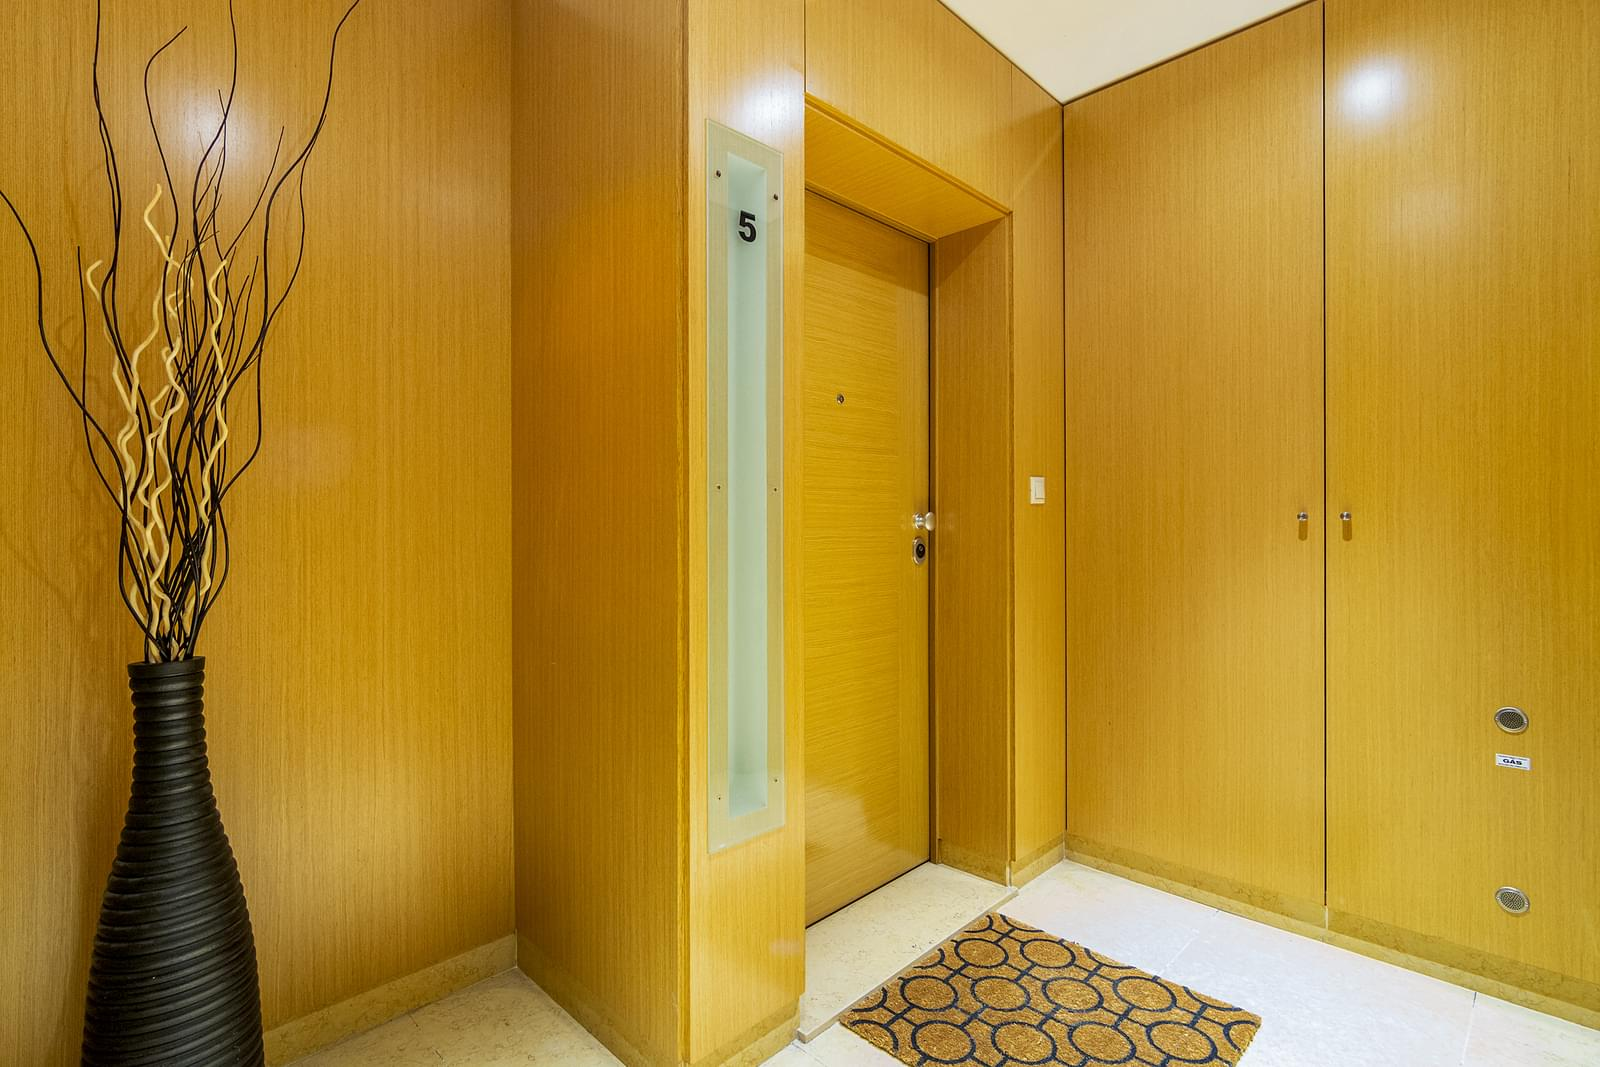 pf14588-apartamento-t5-lisboa-6aa5776a-732e-48fd-83d2-e2ea32a26b6e